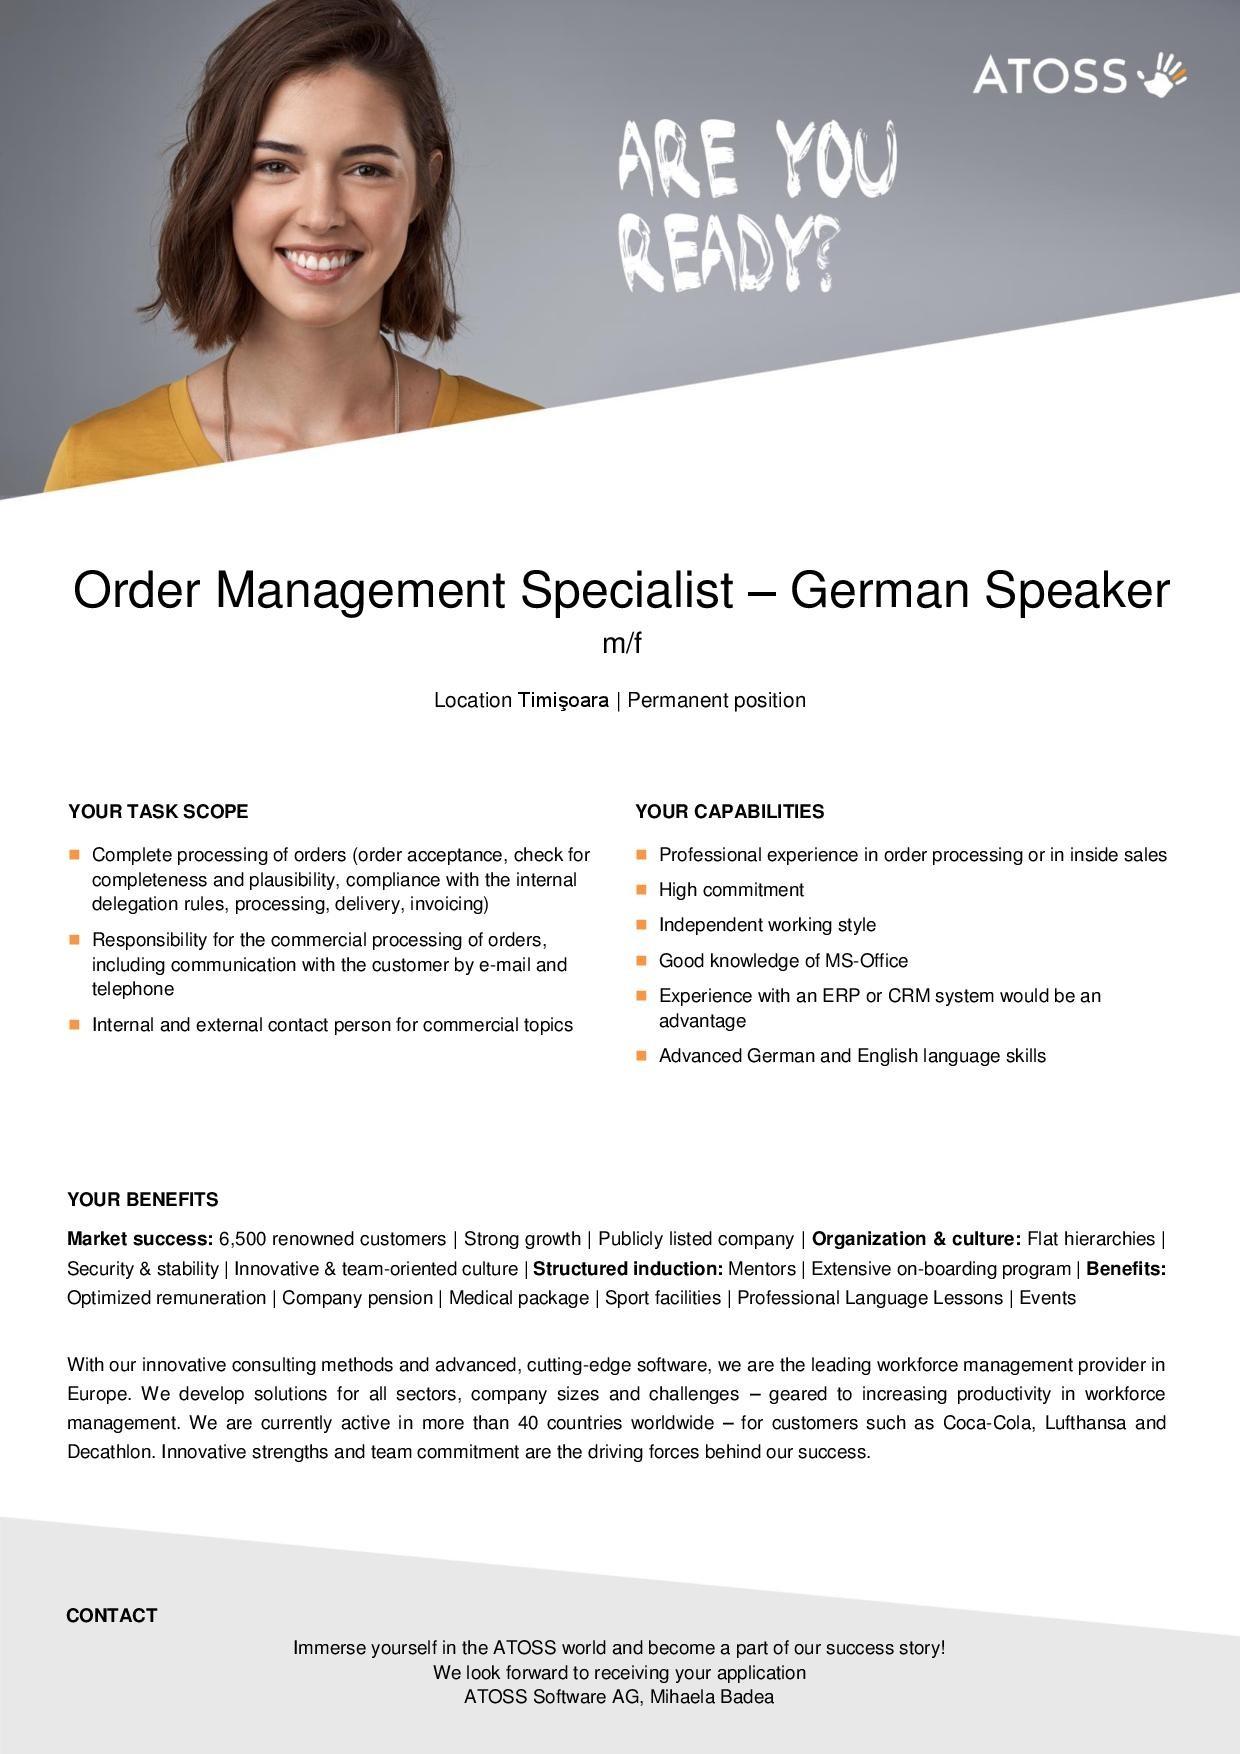 Order Management Specialist